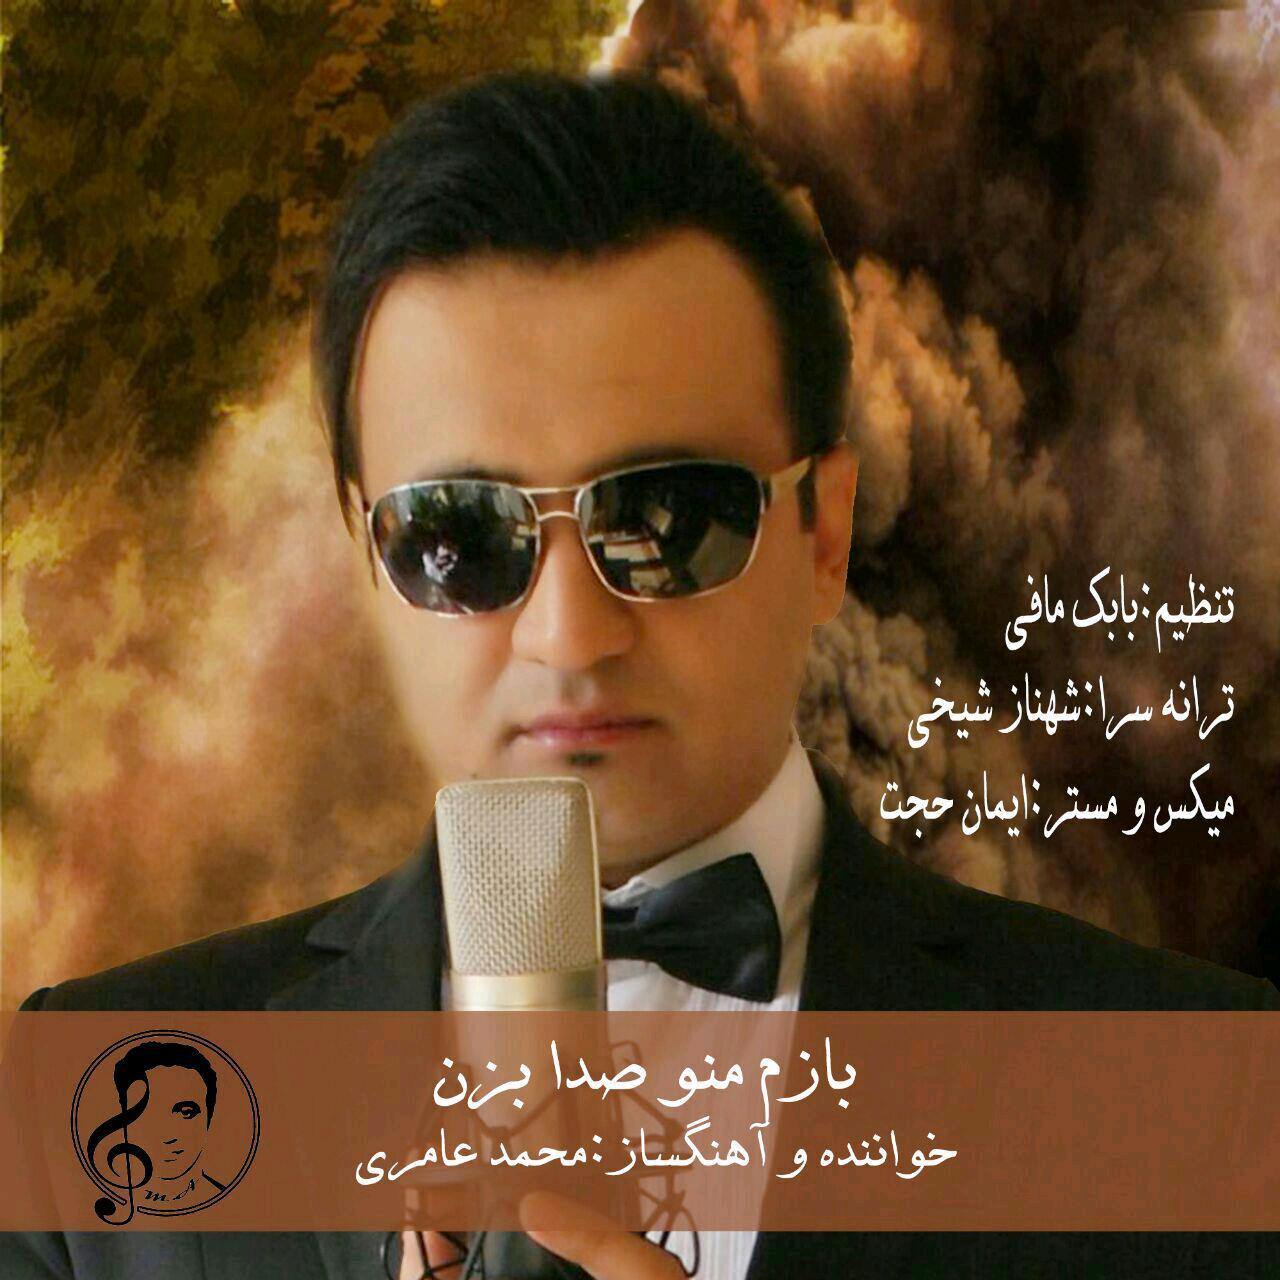 http://dl.rasanejavan.com/RadioJavan%201396/ordibehesht%2096/21/Mohammad%20Ameri%20-%20Bazam%20Mano%20Seda%20Bezan.jpg